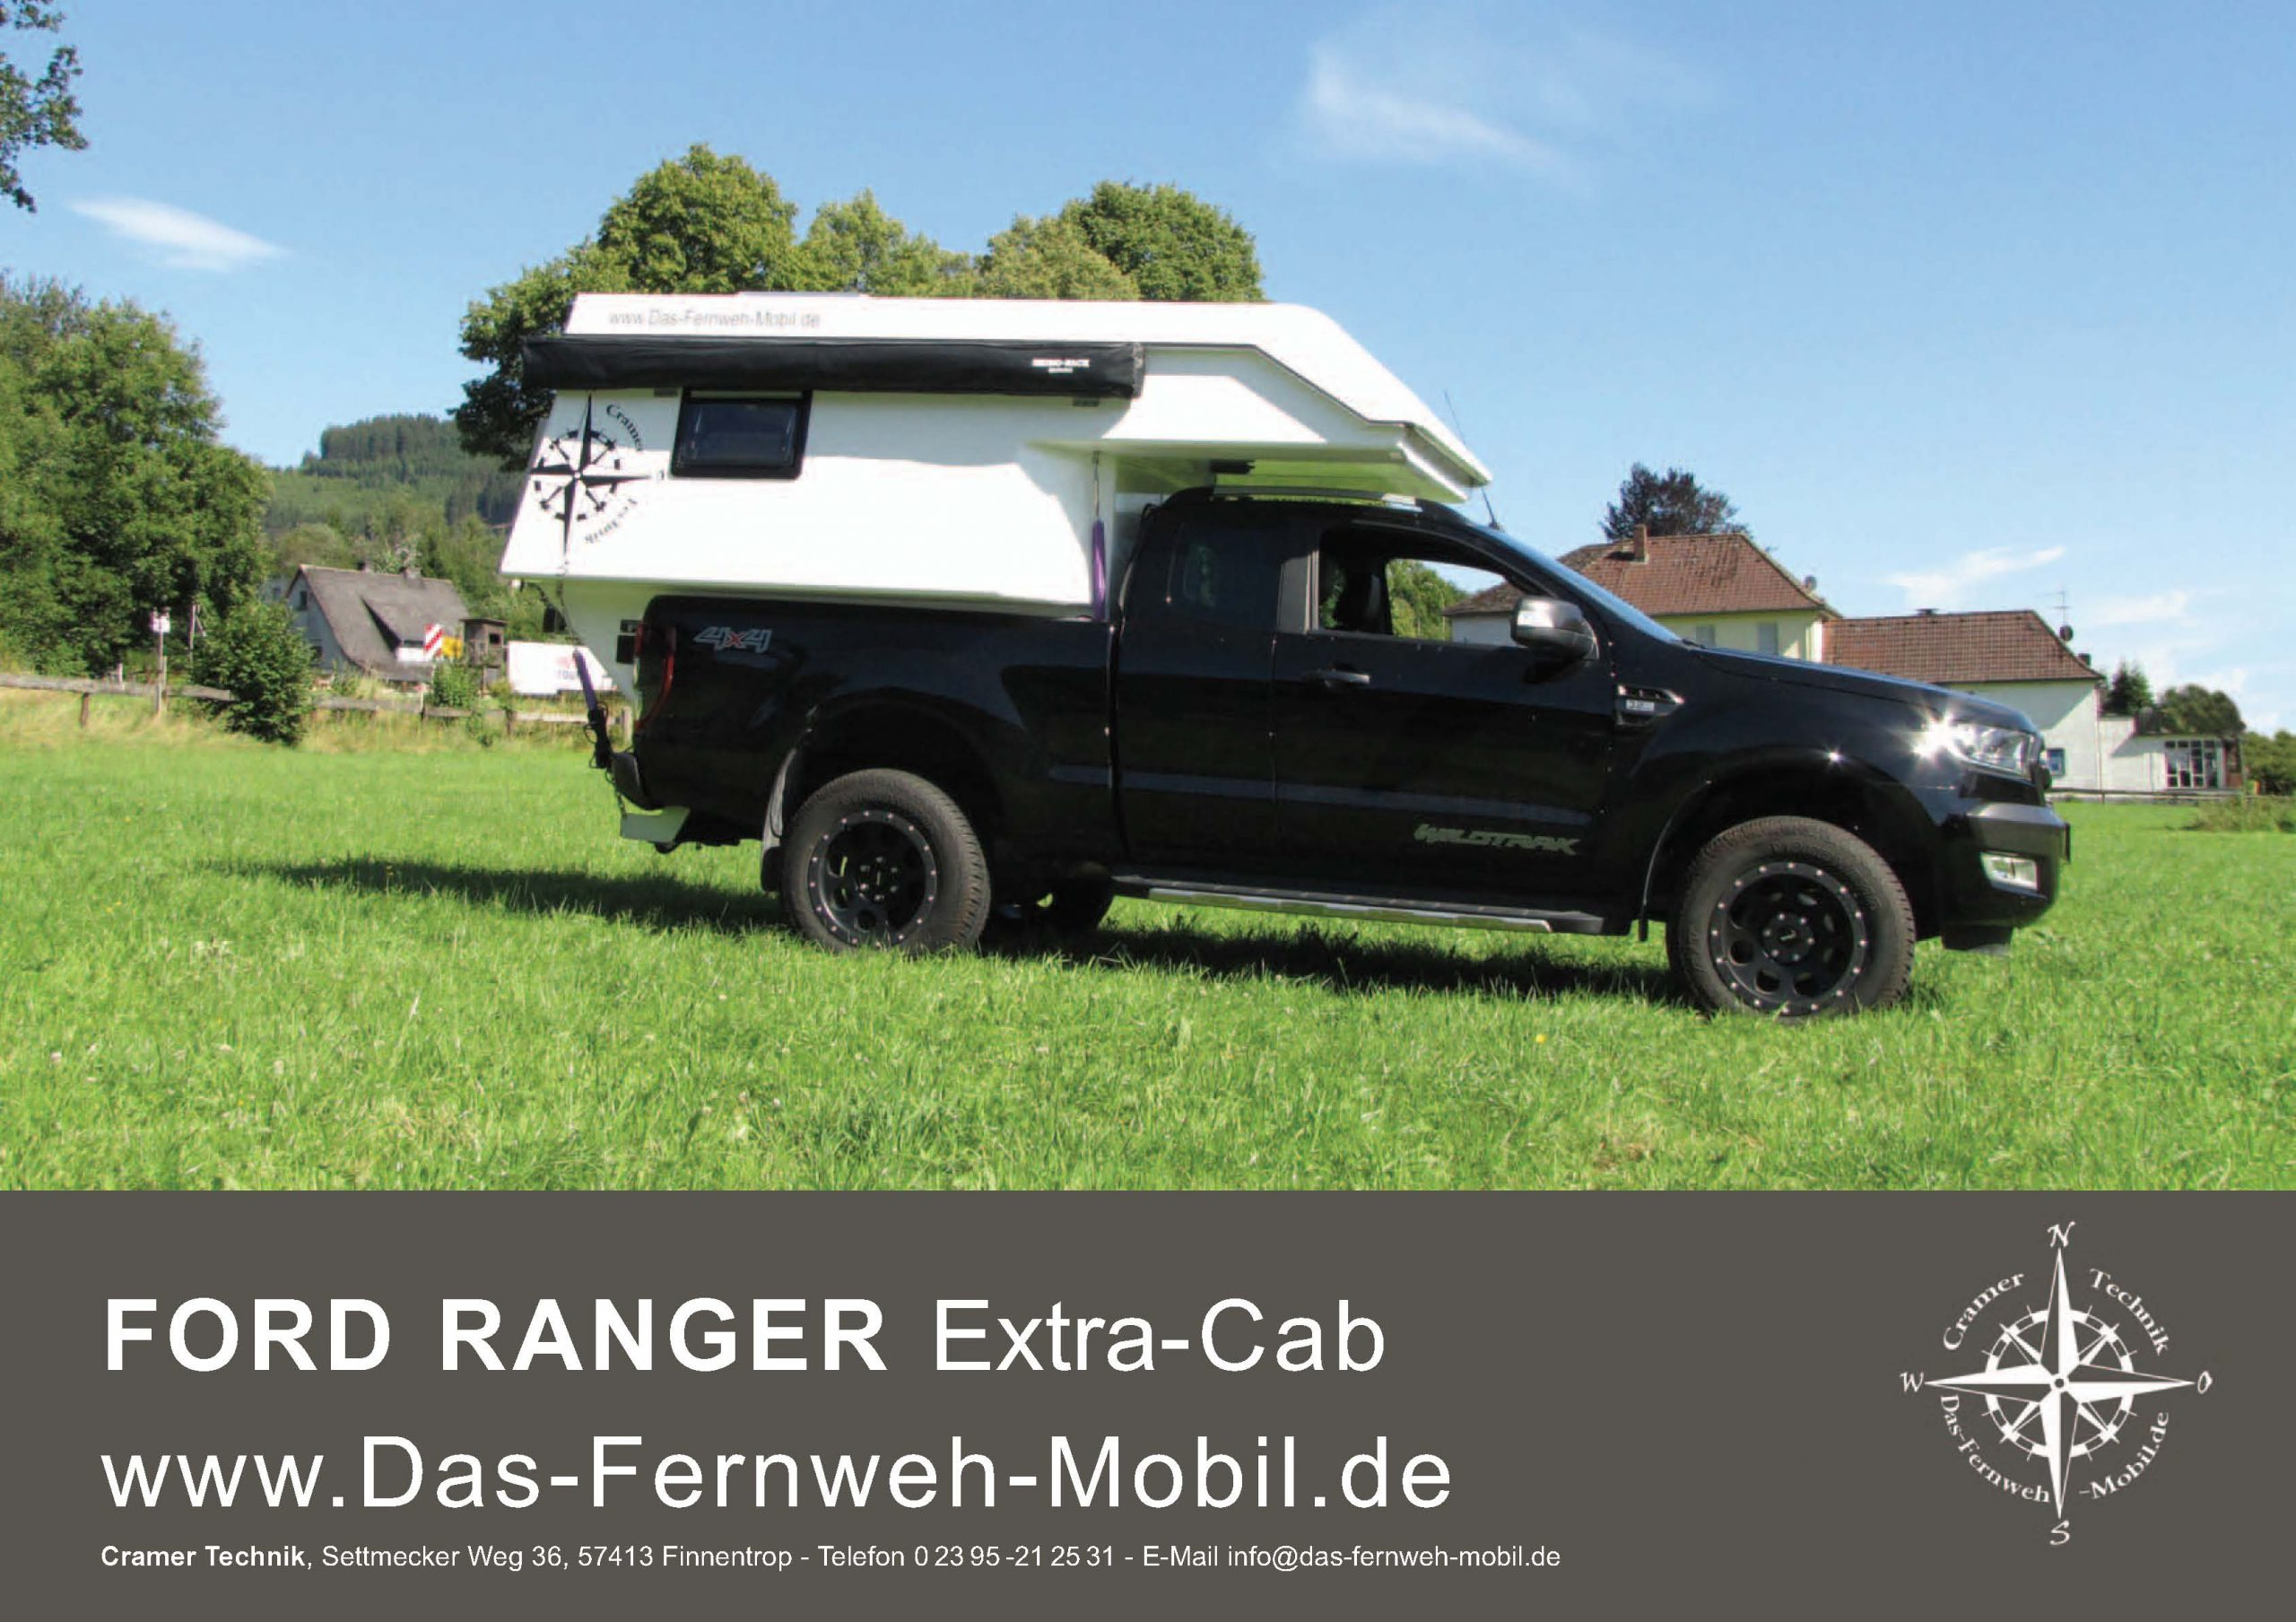 Datenblatt-Ford-Ranger-Extra-Cab-102019-k_Seite_1